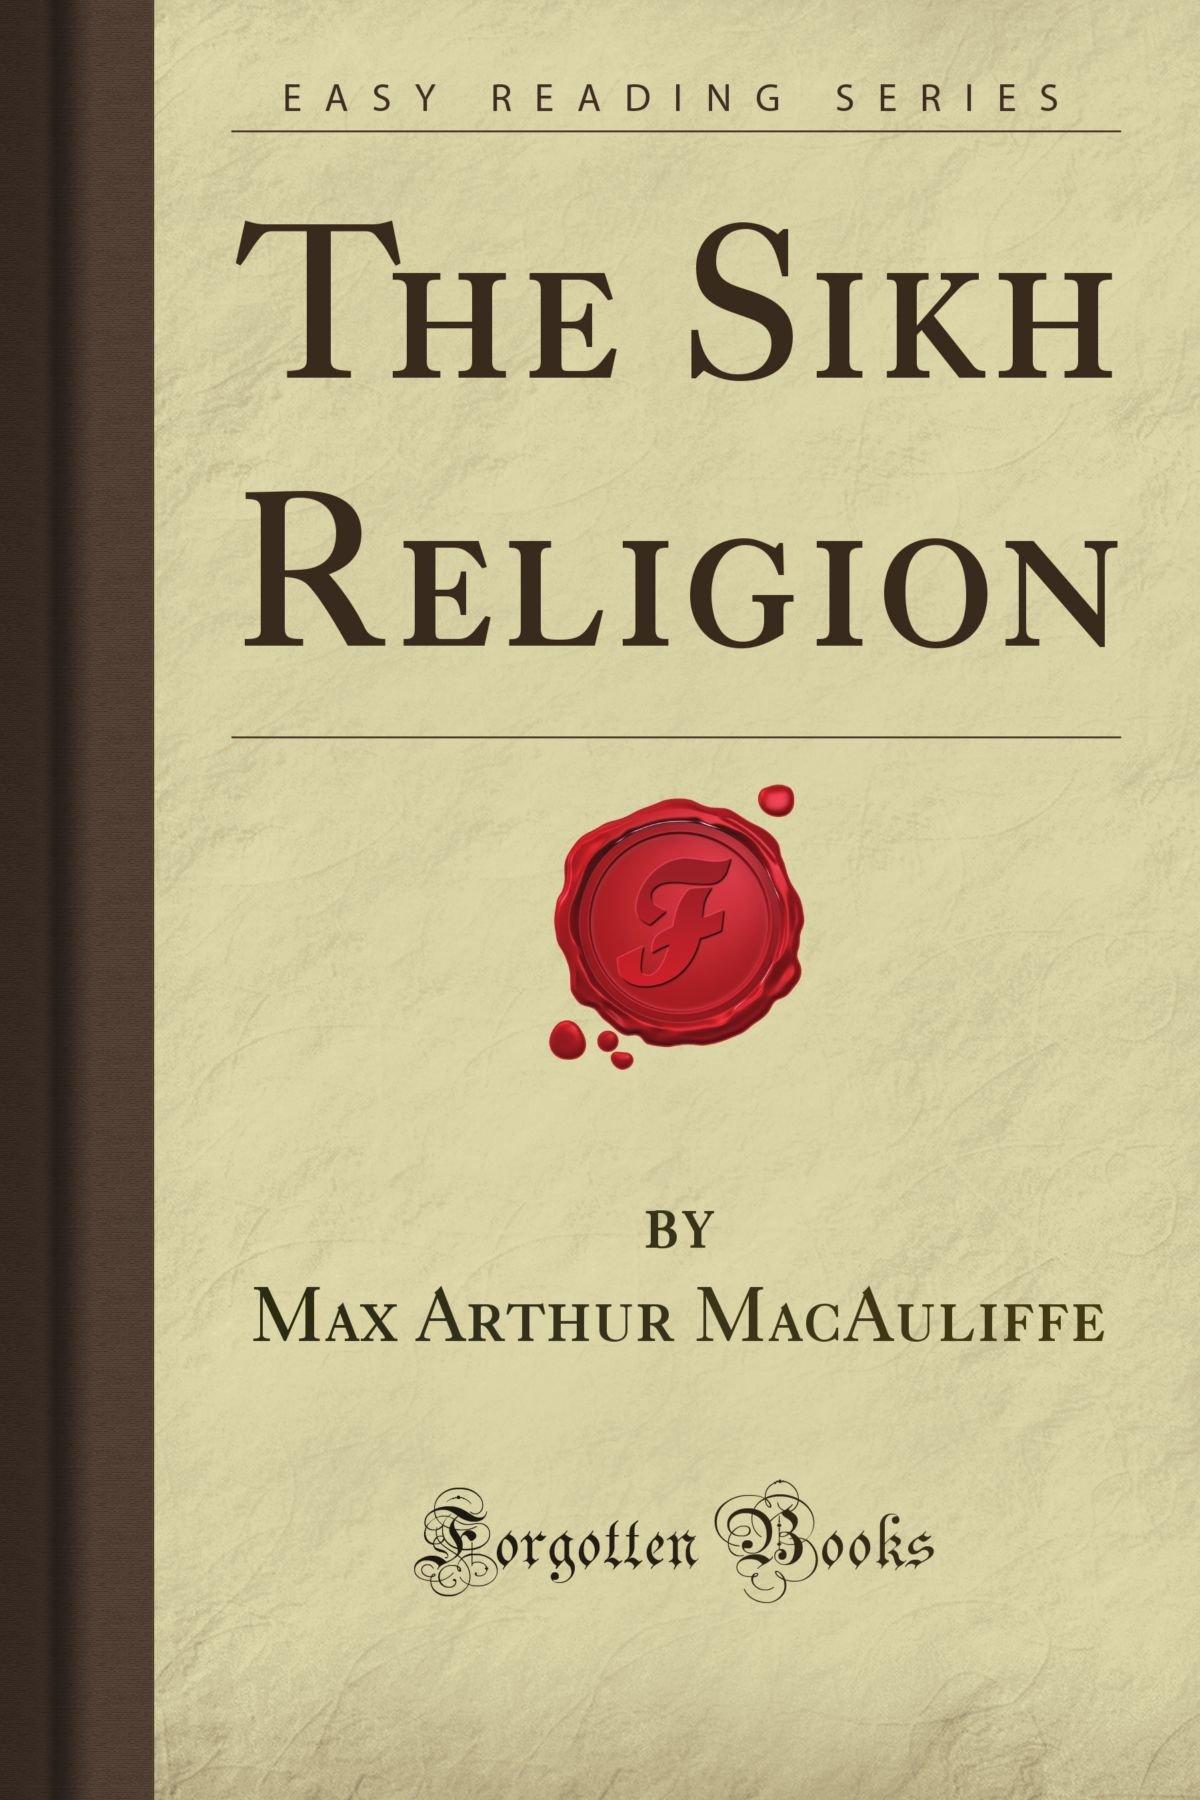 The Sikh Religion (Forgotten Books) (Inglese) Copertina flessibile – 7 mag 2008 Max Arthur MacAuliffe 1606200992 RELIGION / Sikhism